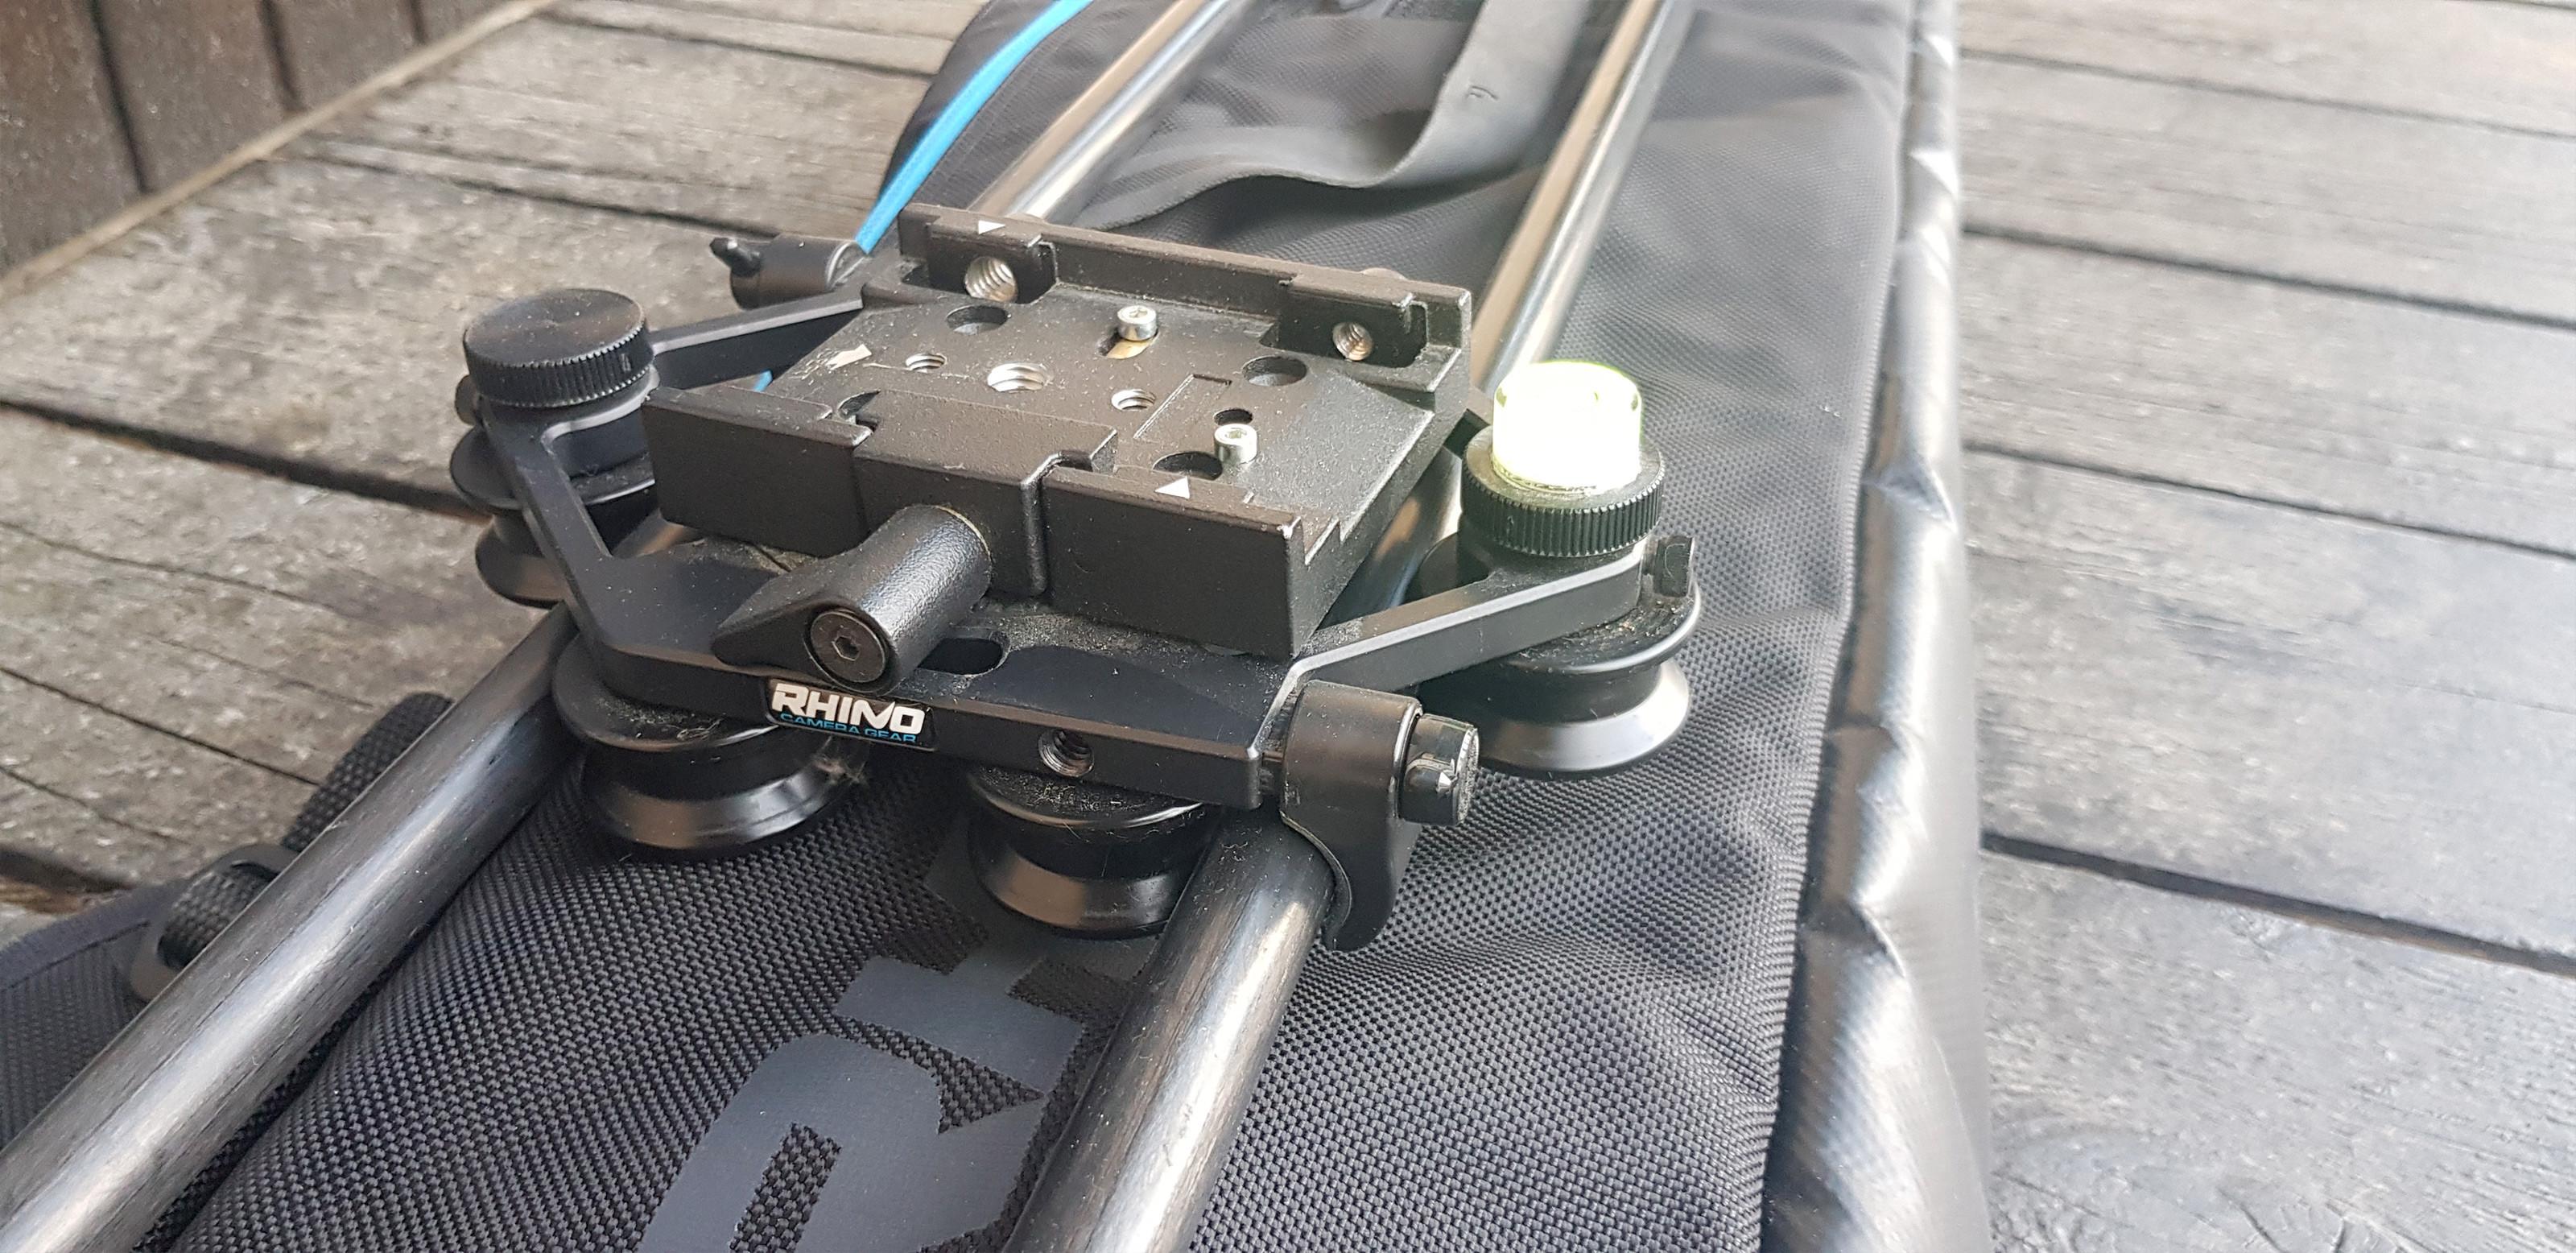 Slider Carbon rhino camera